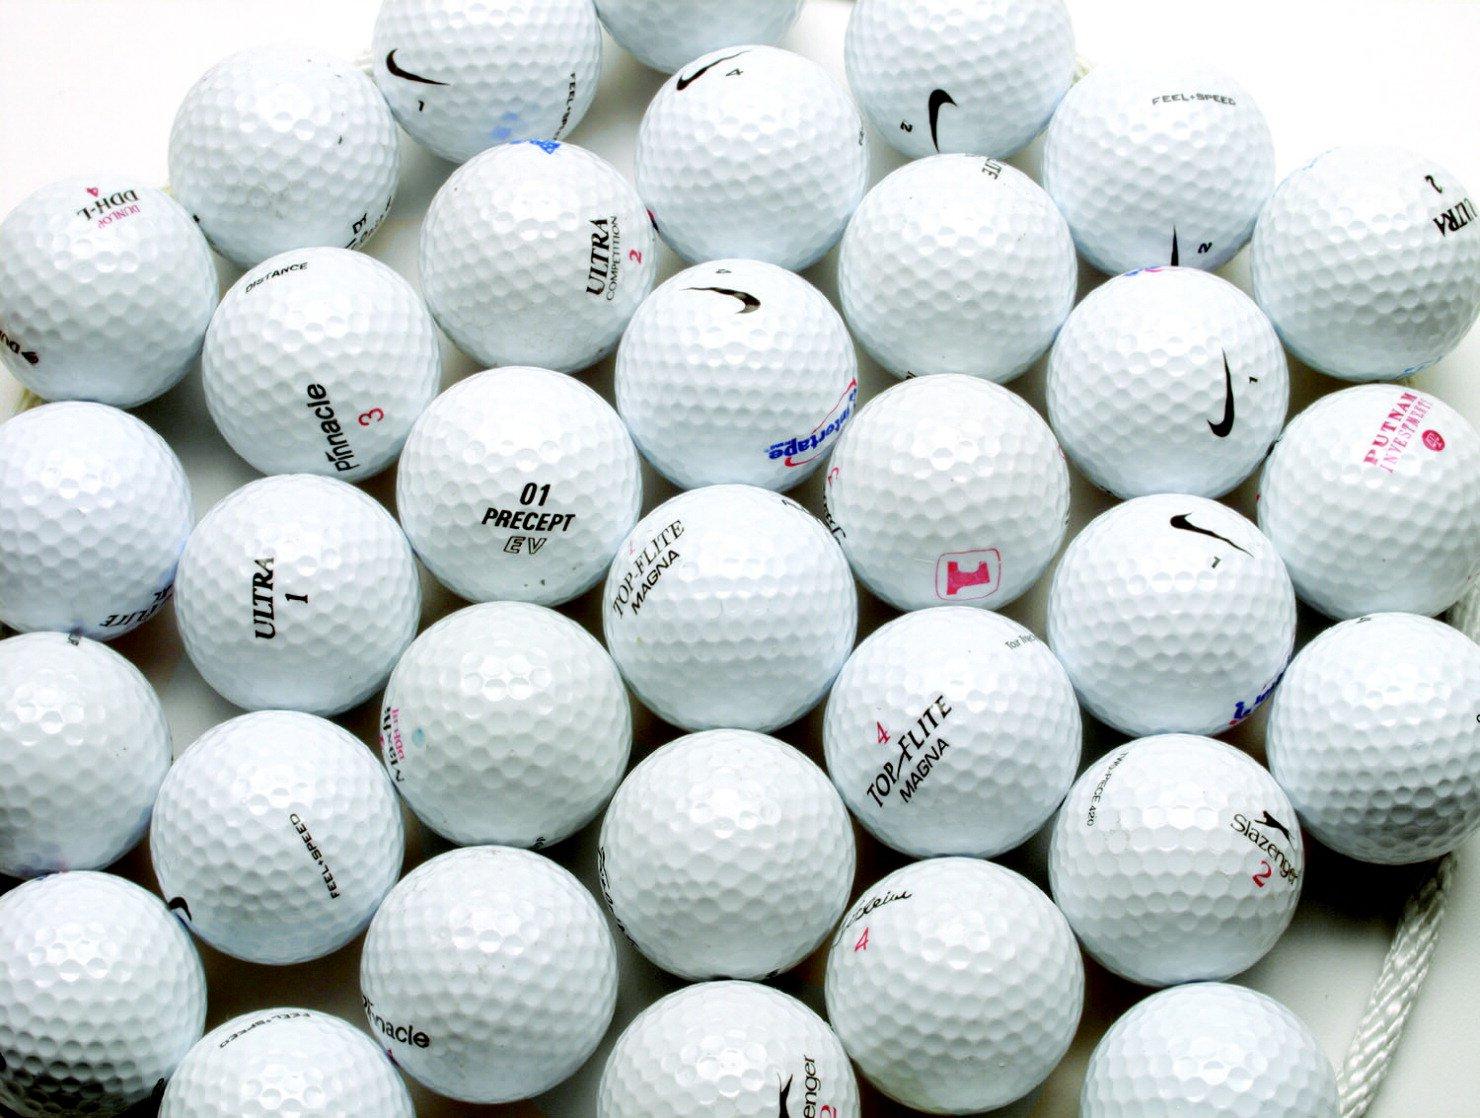 Sportime D-500 Bulk Re-Load Golf Balls